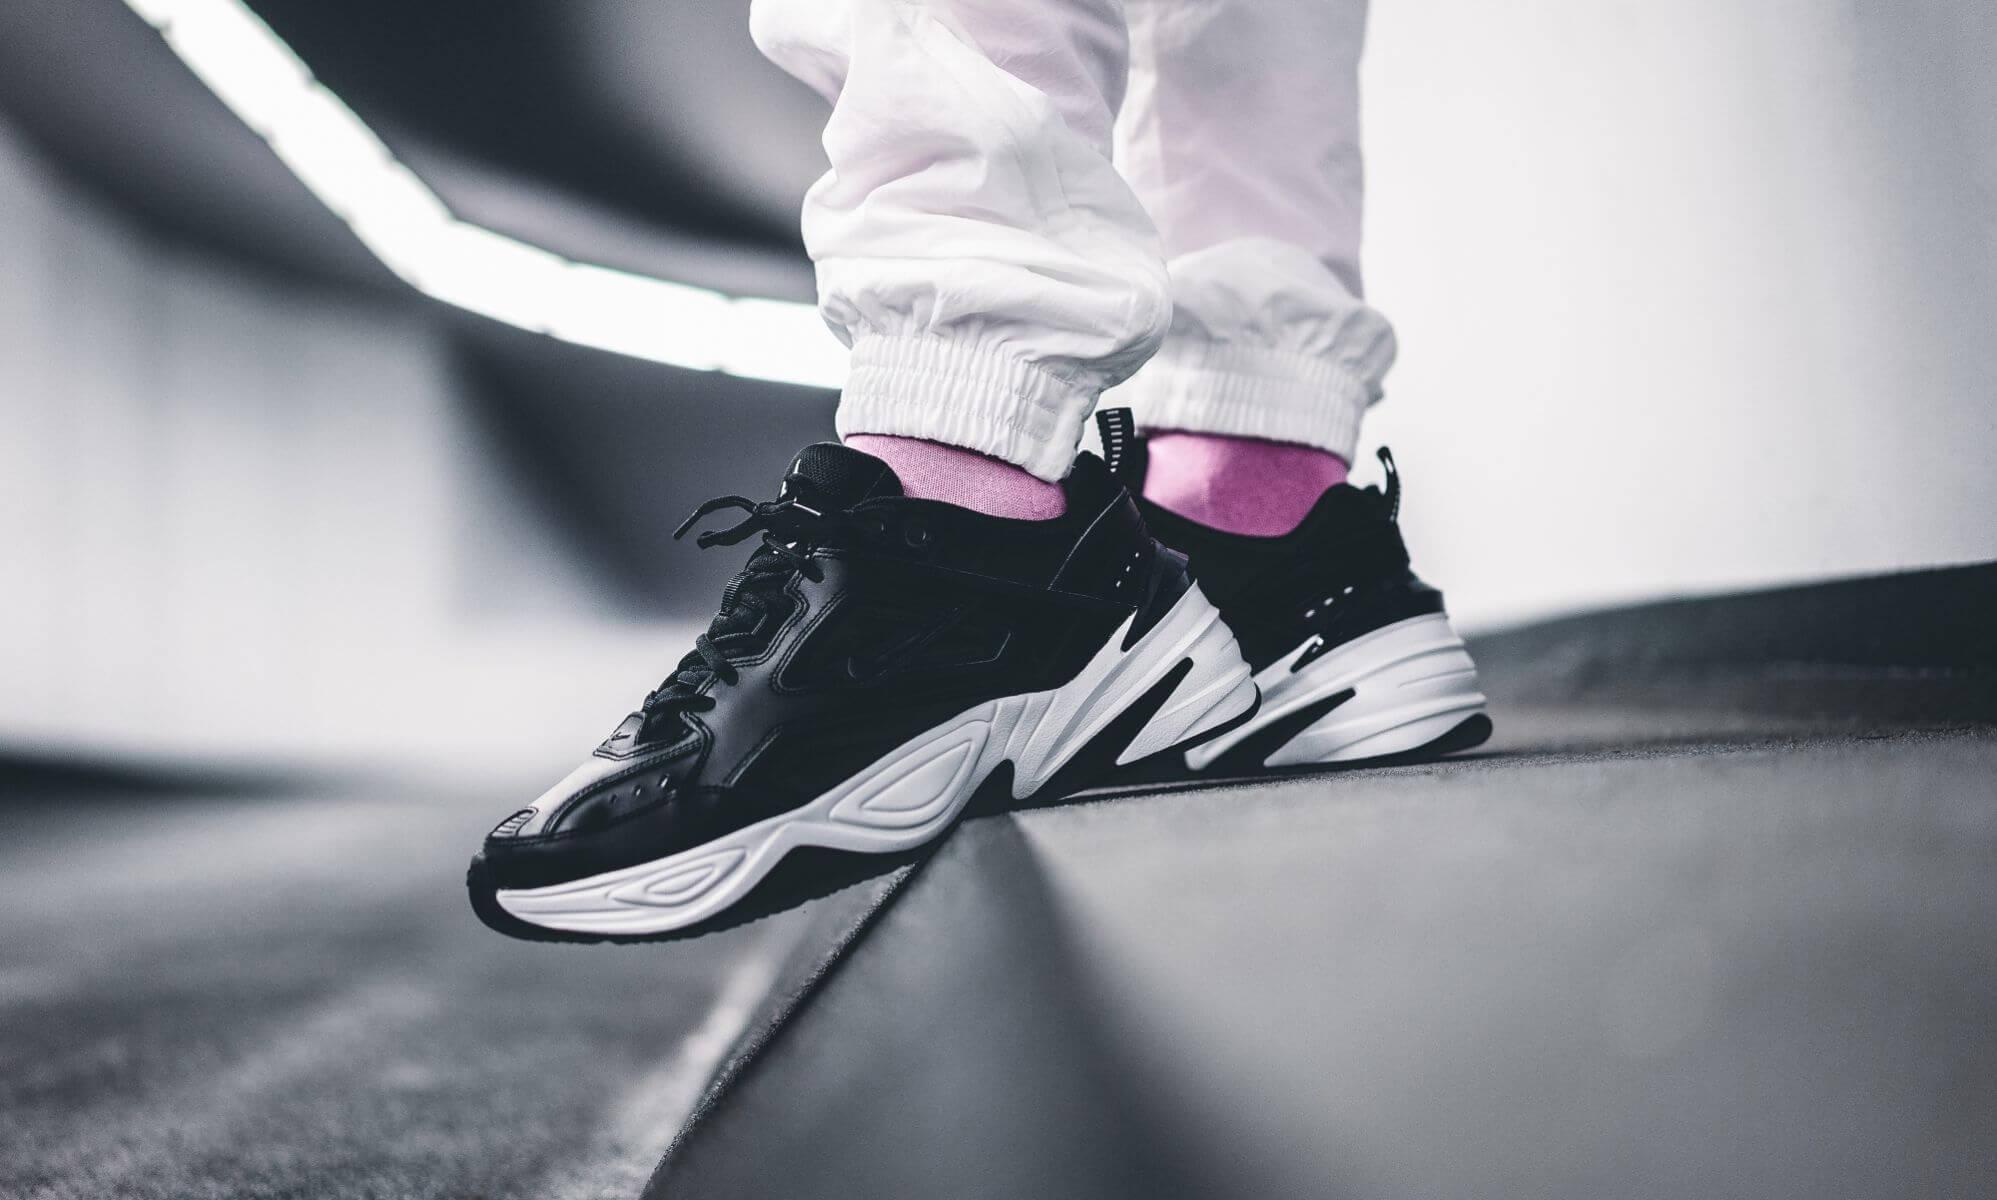 Giày Nike M2k Tekno đen on feet